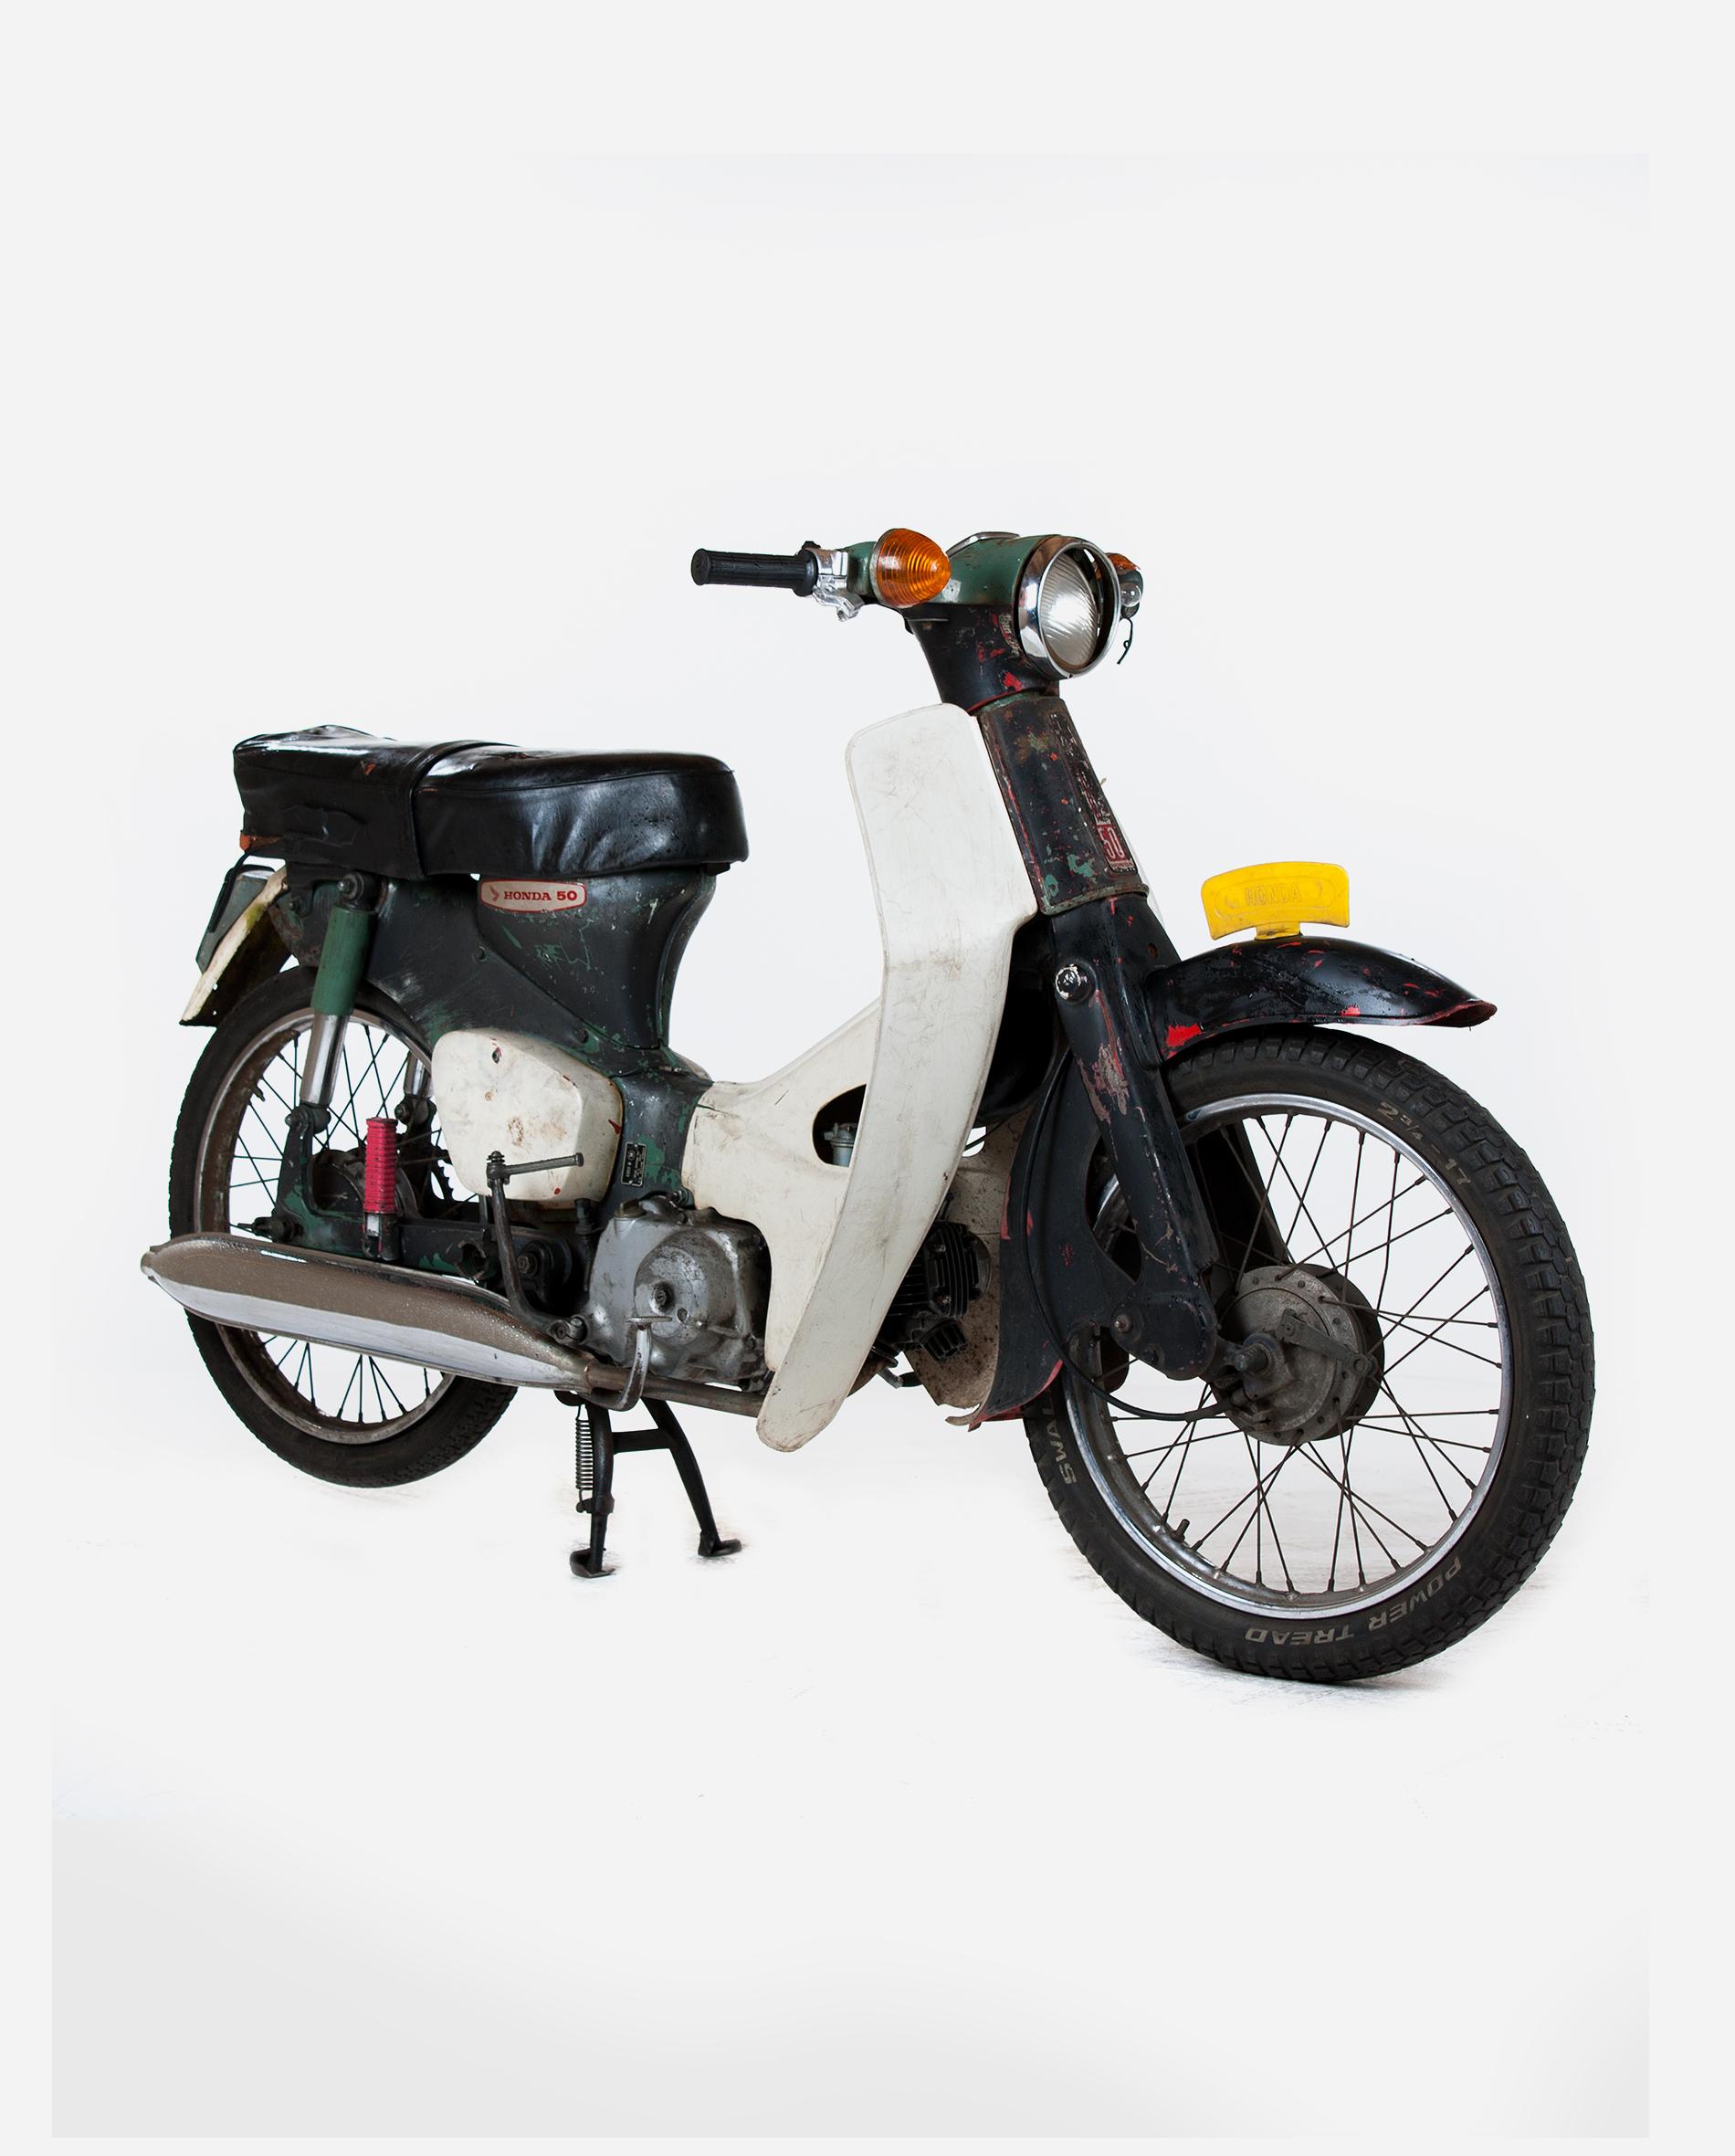 Honda-c50-black-rv · Fourstrokebarn